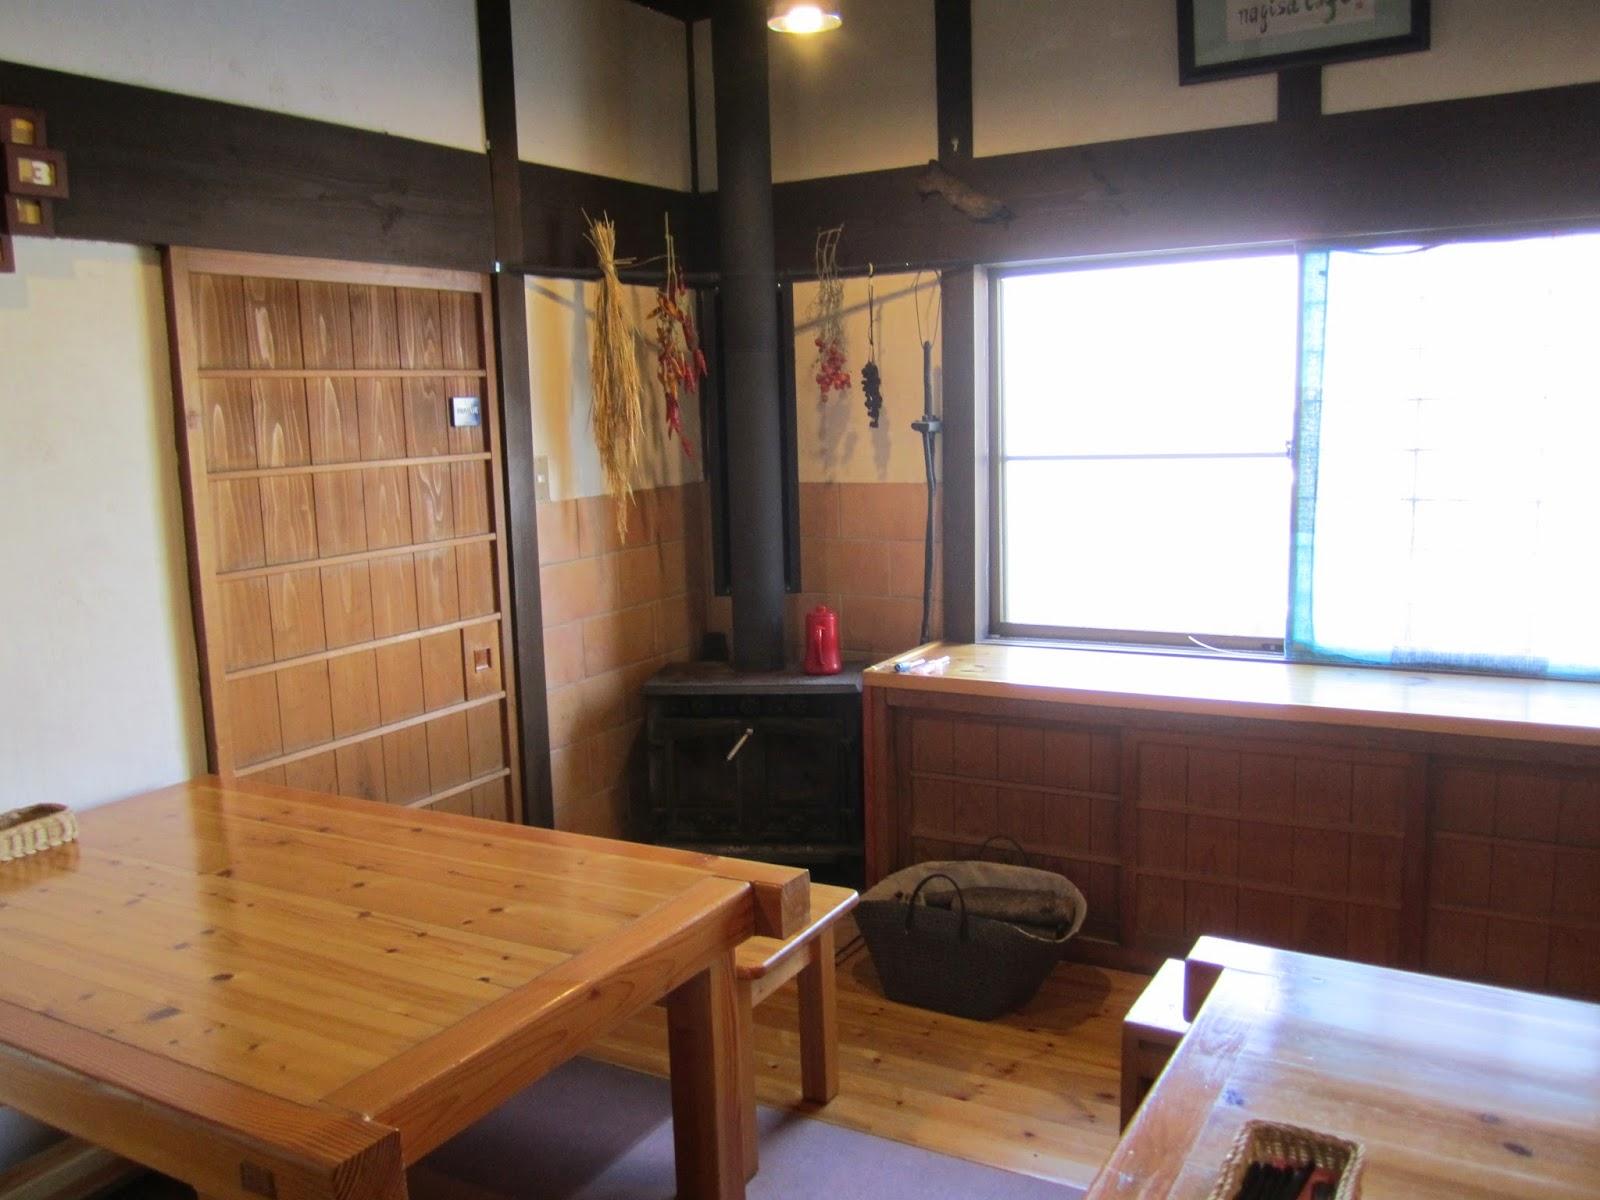 Nagisa Cafe Hachinohe City ナギサカフェ 八戸市